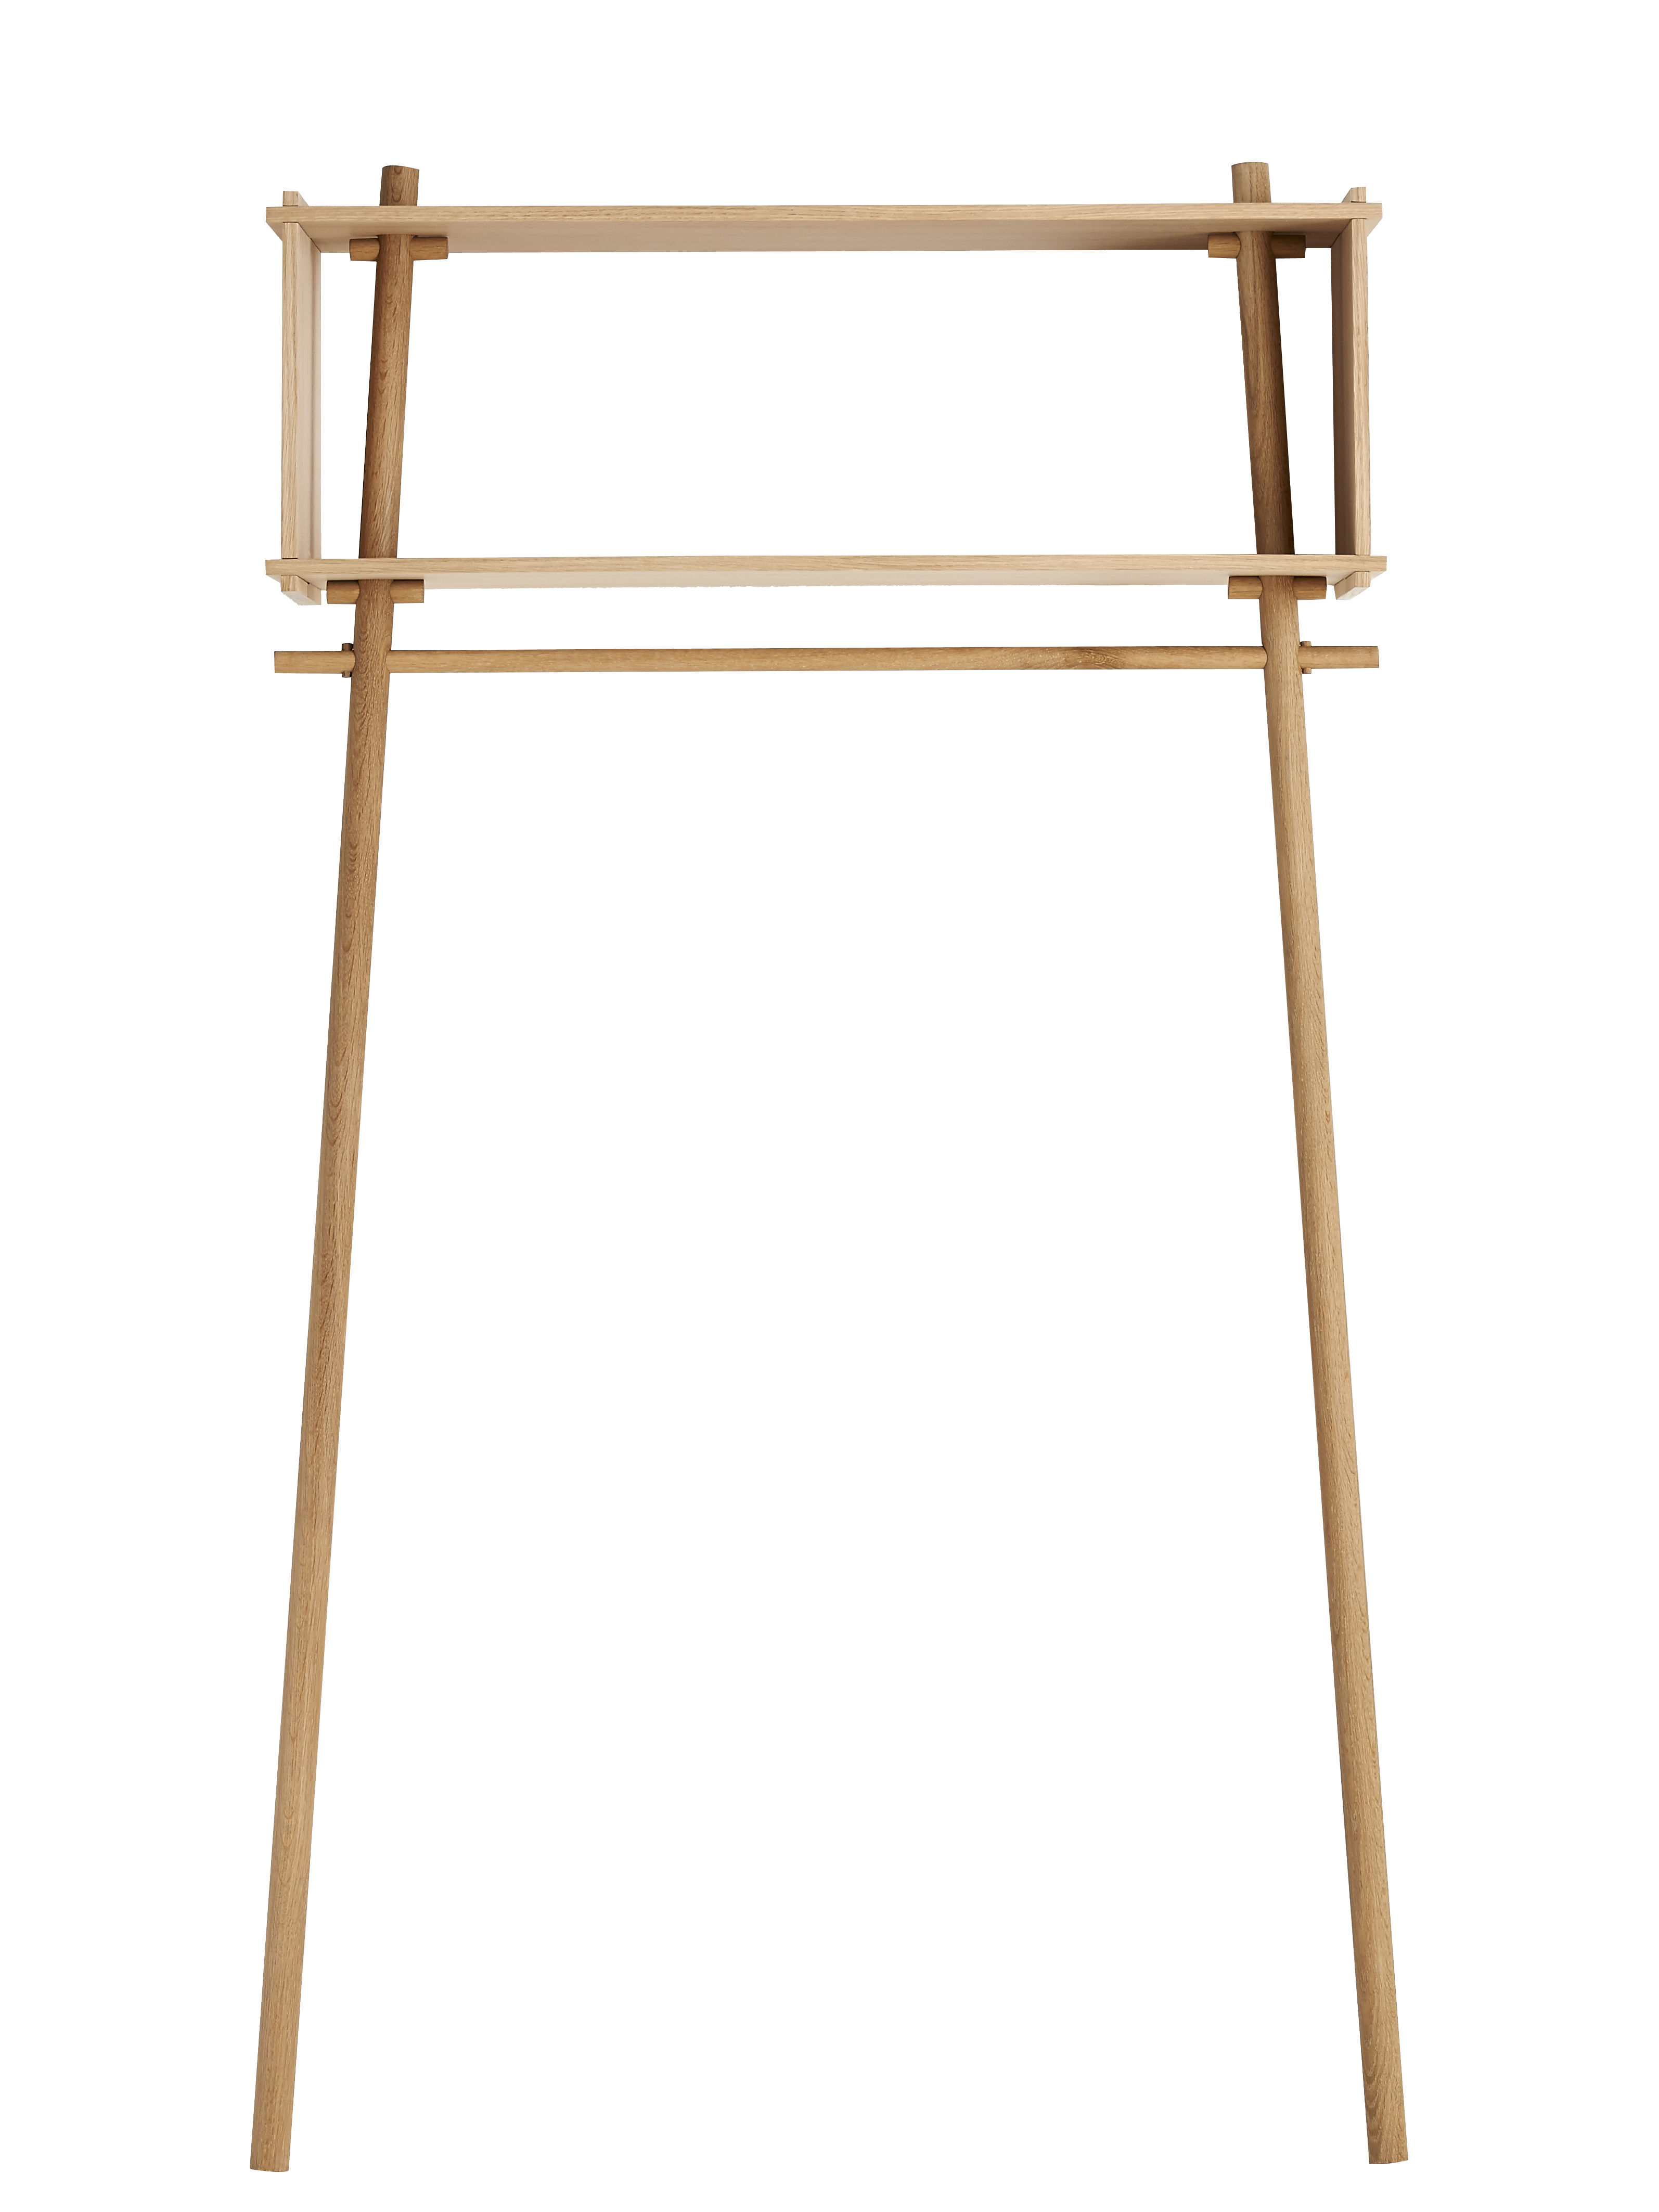 Furniture - Bookcases & Bookshelves - Töjbox Large Rack - Shelf - W 112 x H 200 cm by Woud - Soaped oak - Oak plywood, Solid oak